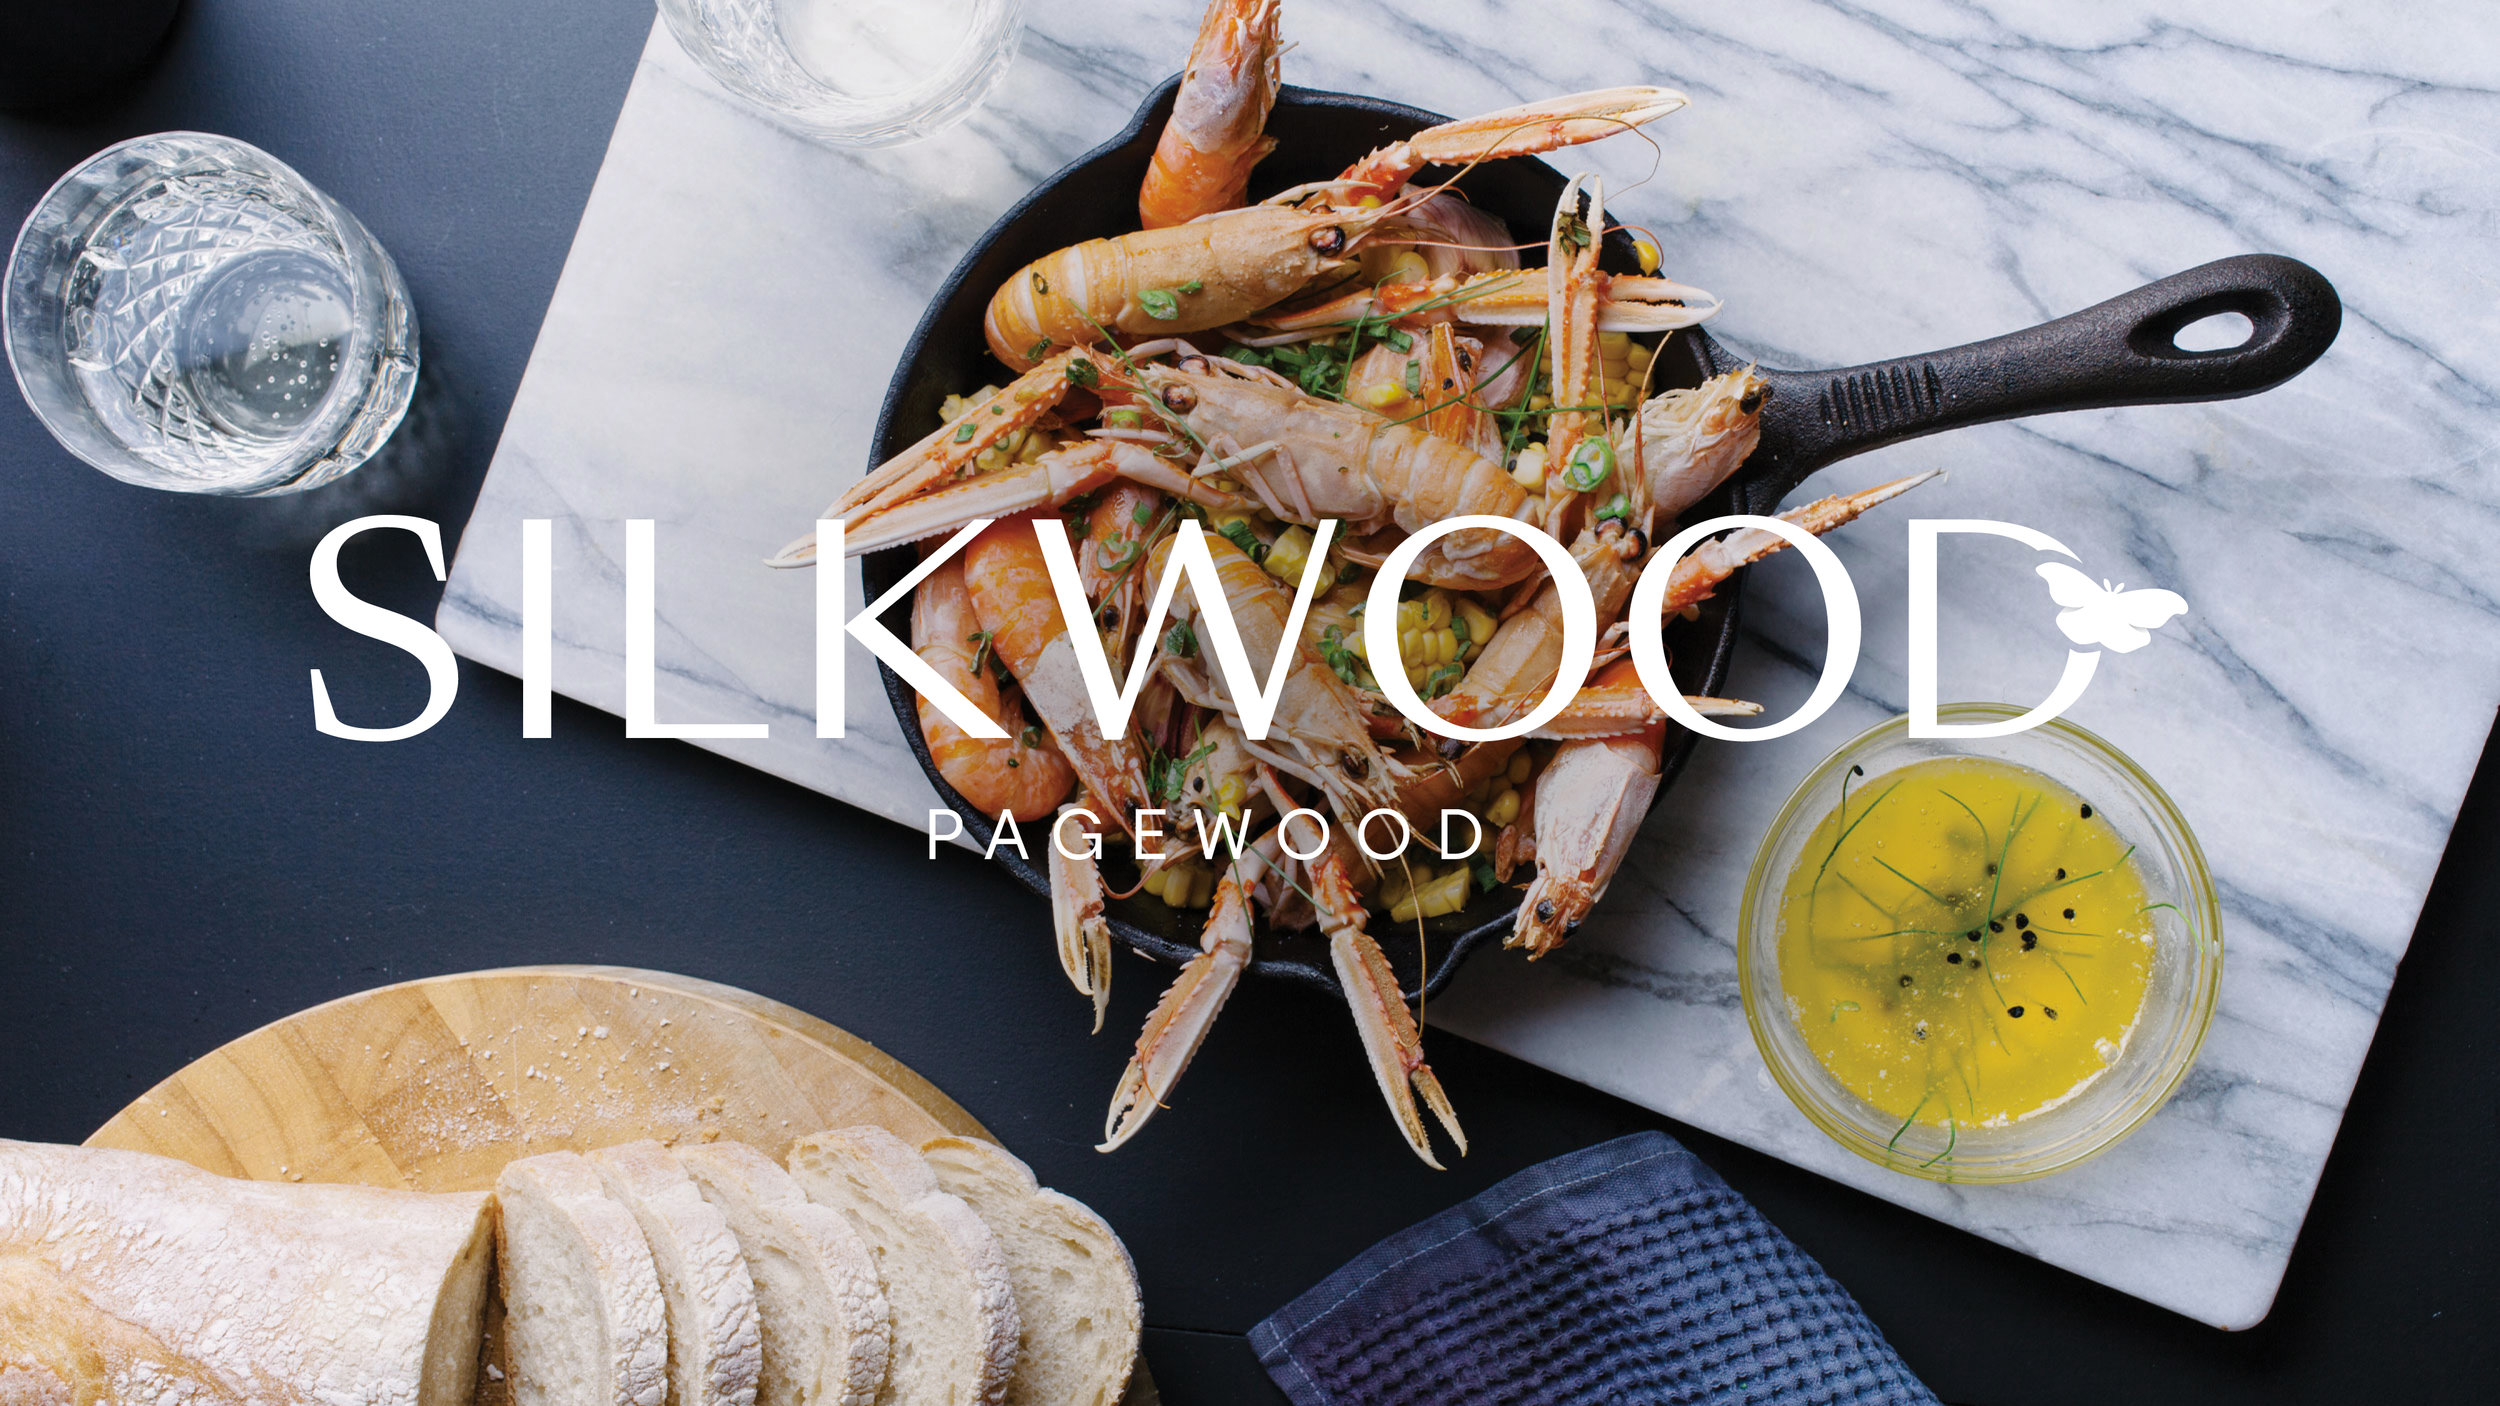 Silkwood_Silkari_TNG_brand_identity_sydney_property_design+01.jpg